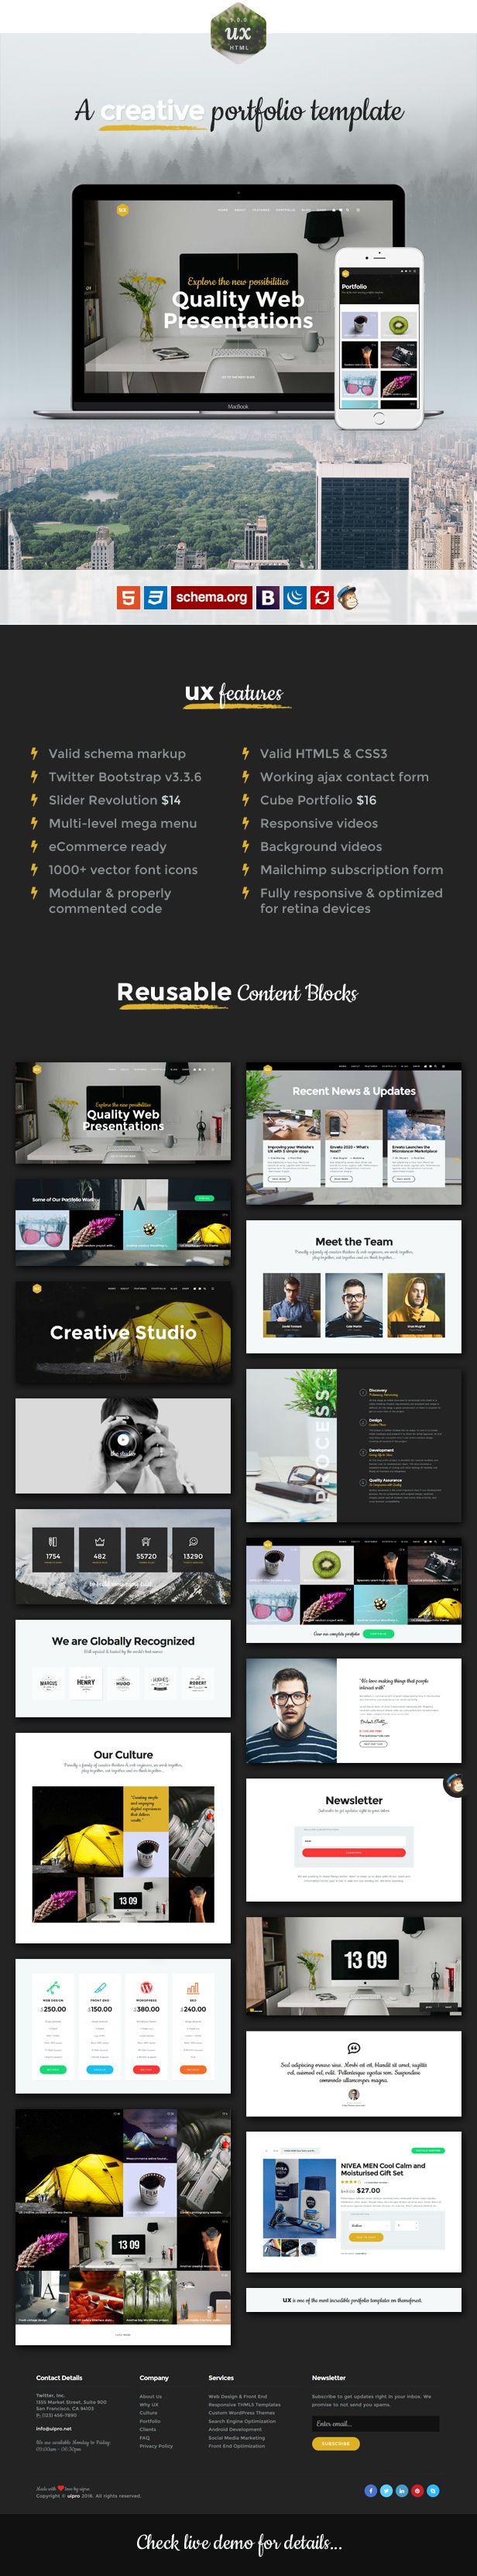 UX - Responsive Bootstrap Creative Portfolio Template | Creative ...